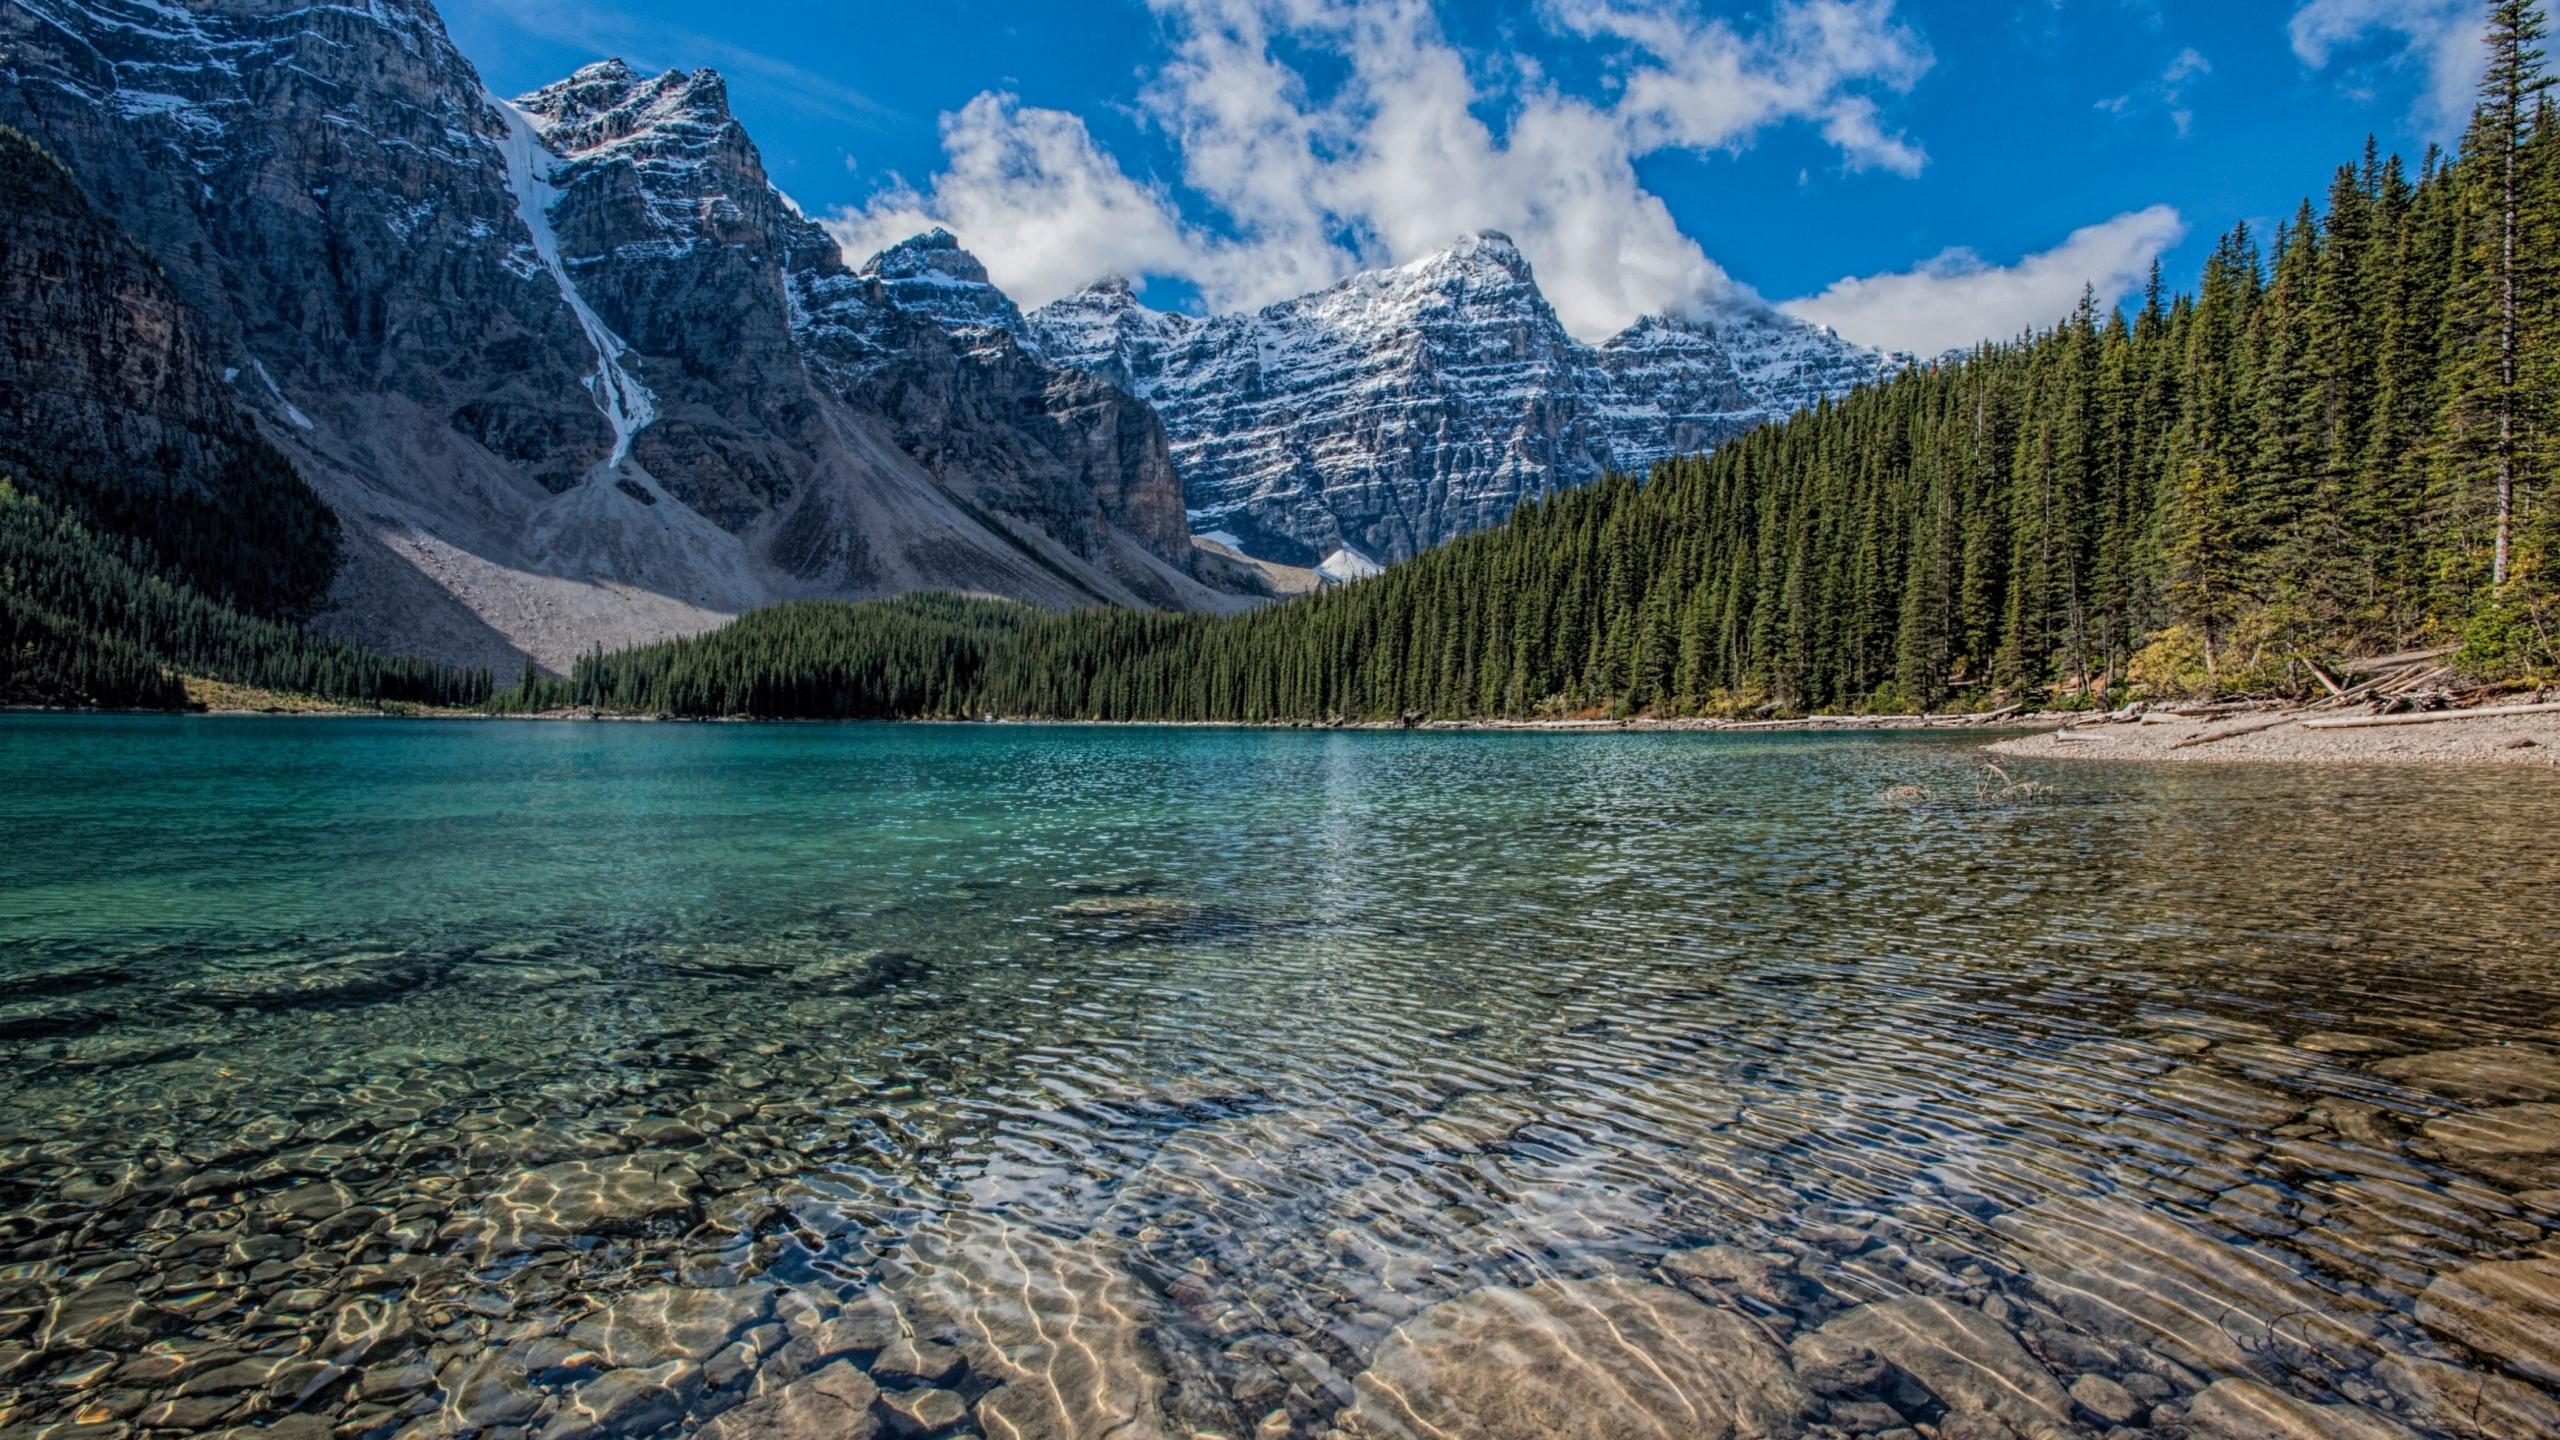 Download 2560x1440 wallpaper clean lake mountains range - Nature wallpaper hd 16 9 ...